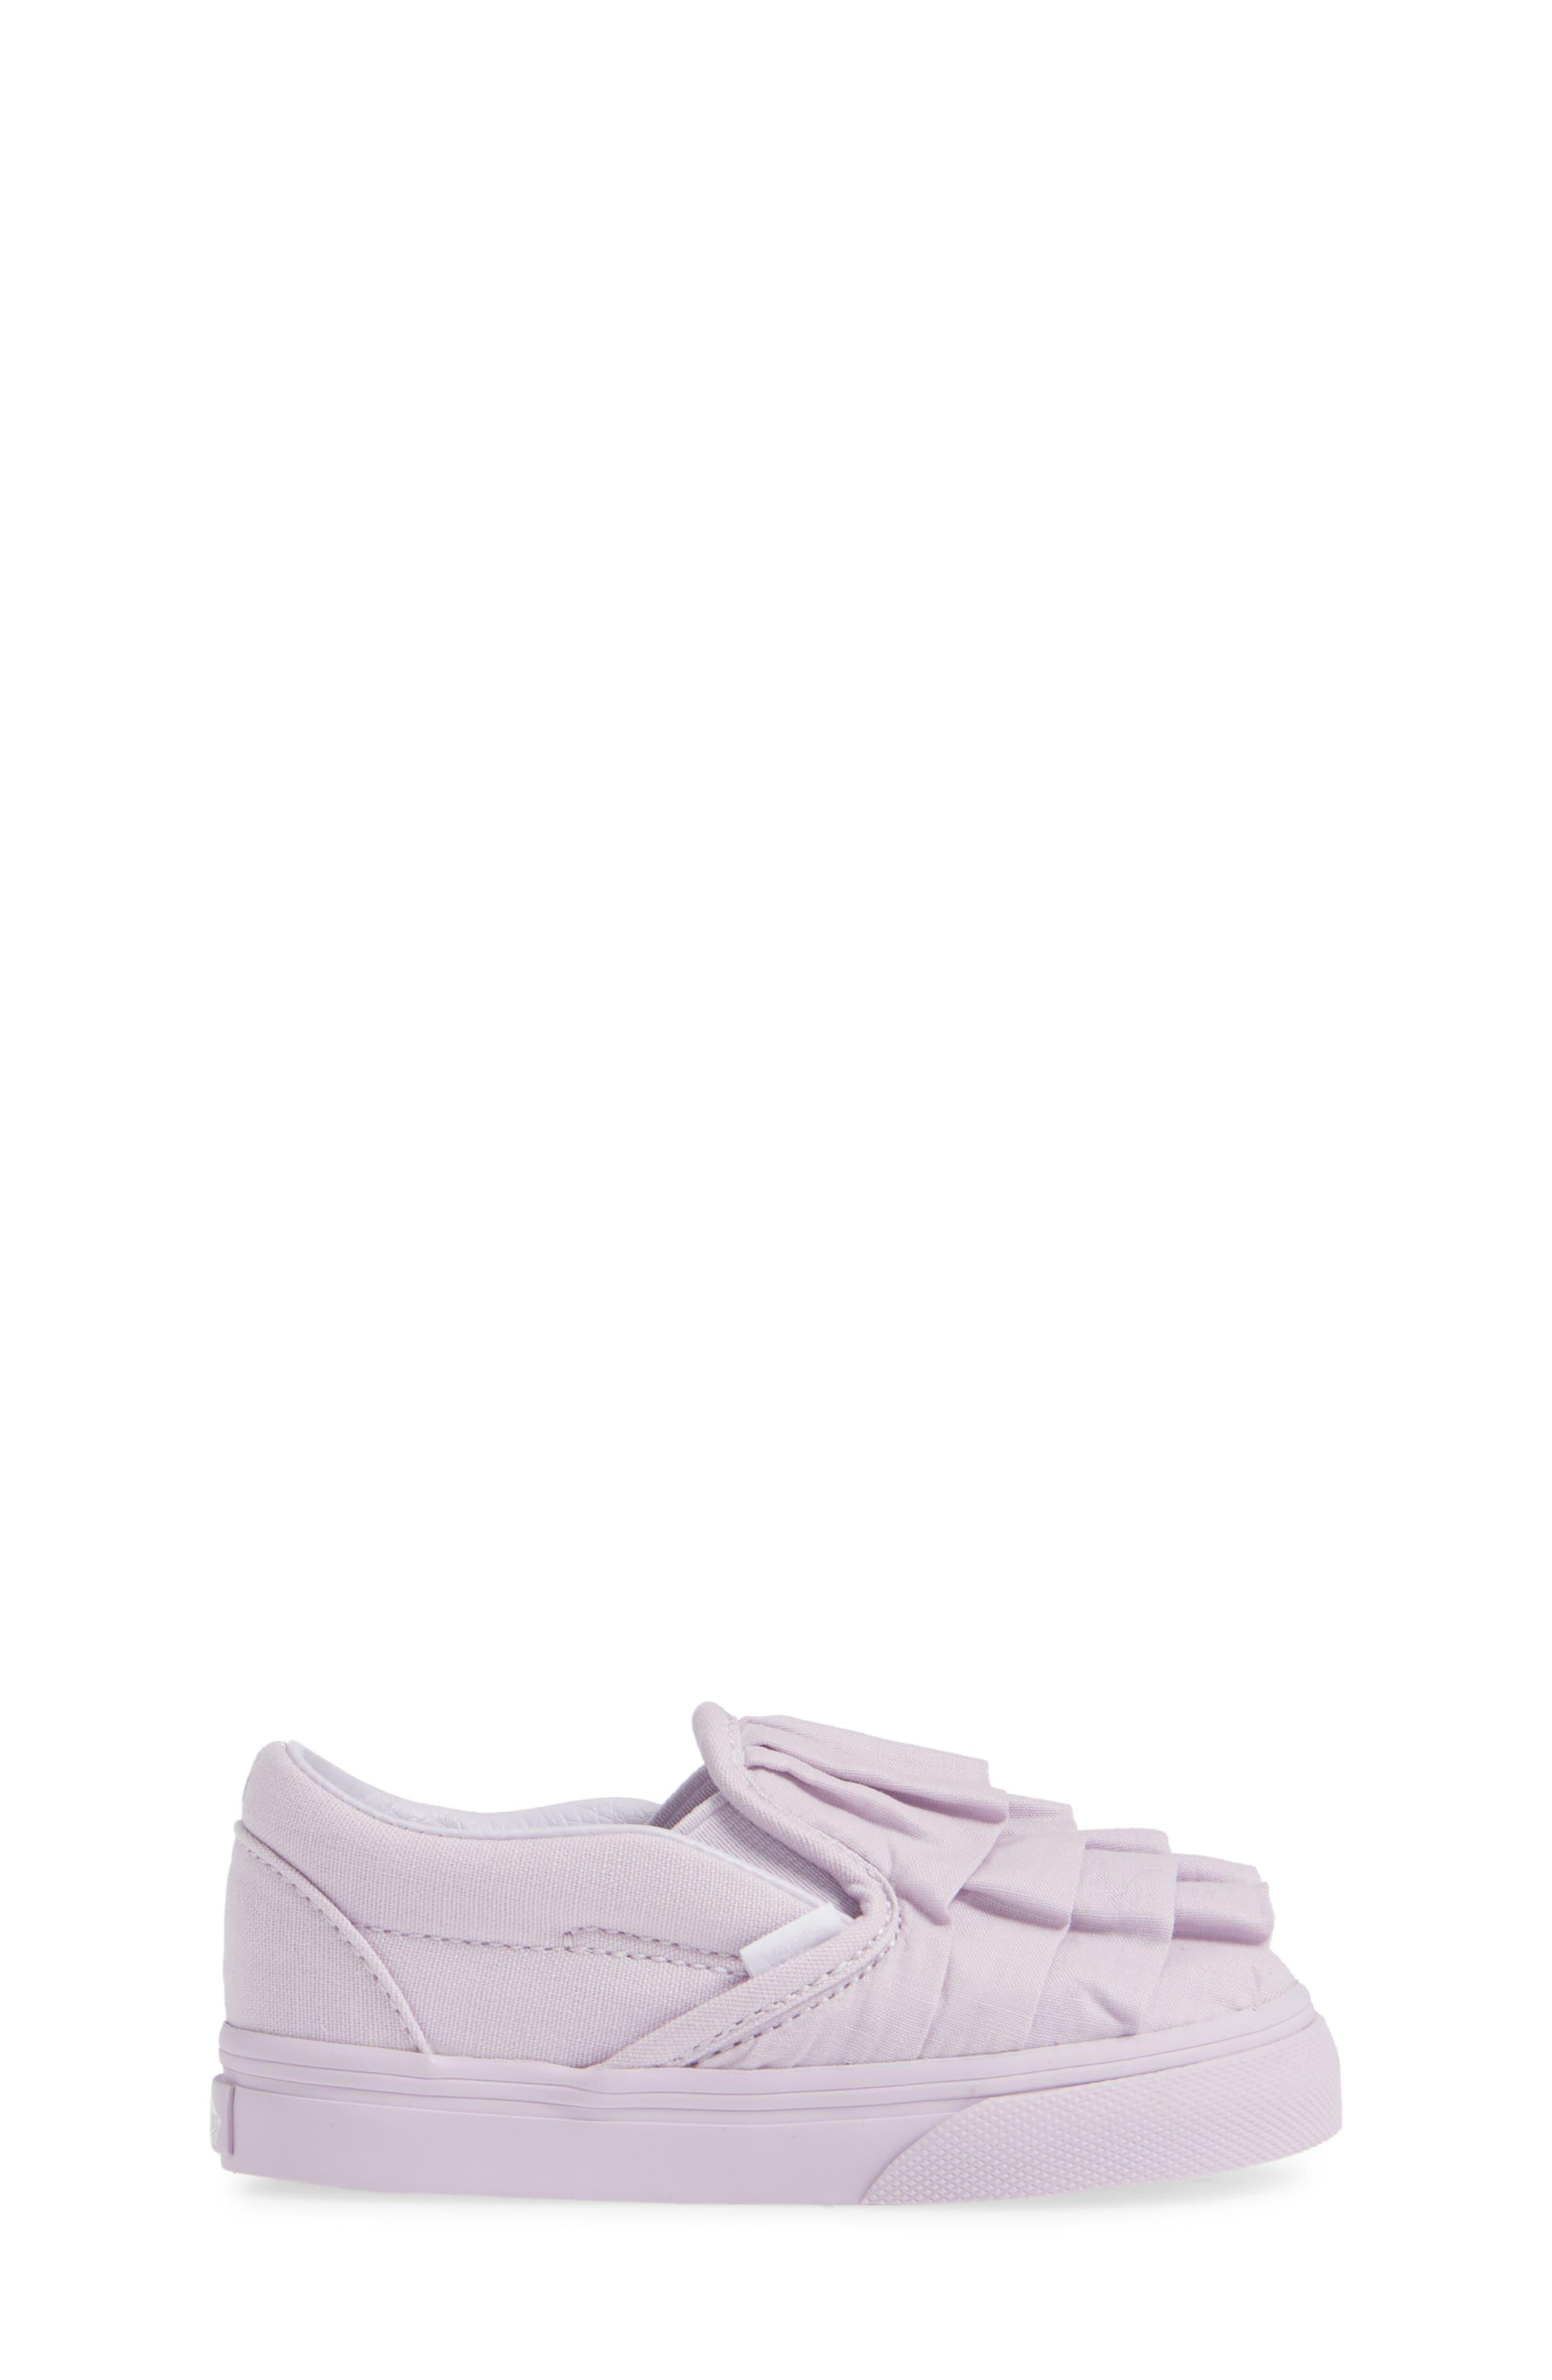 Ruffle Classic Slip-On Sneaker,                             Alternate thumbnail 3, color,                             530